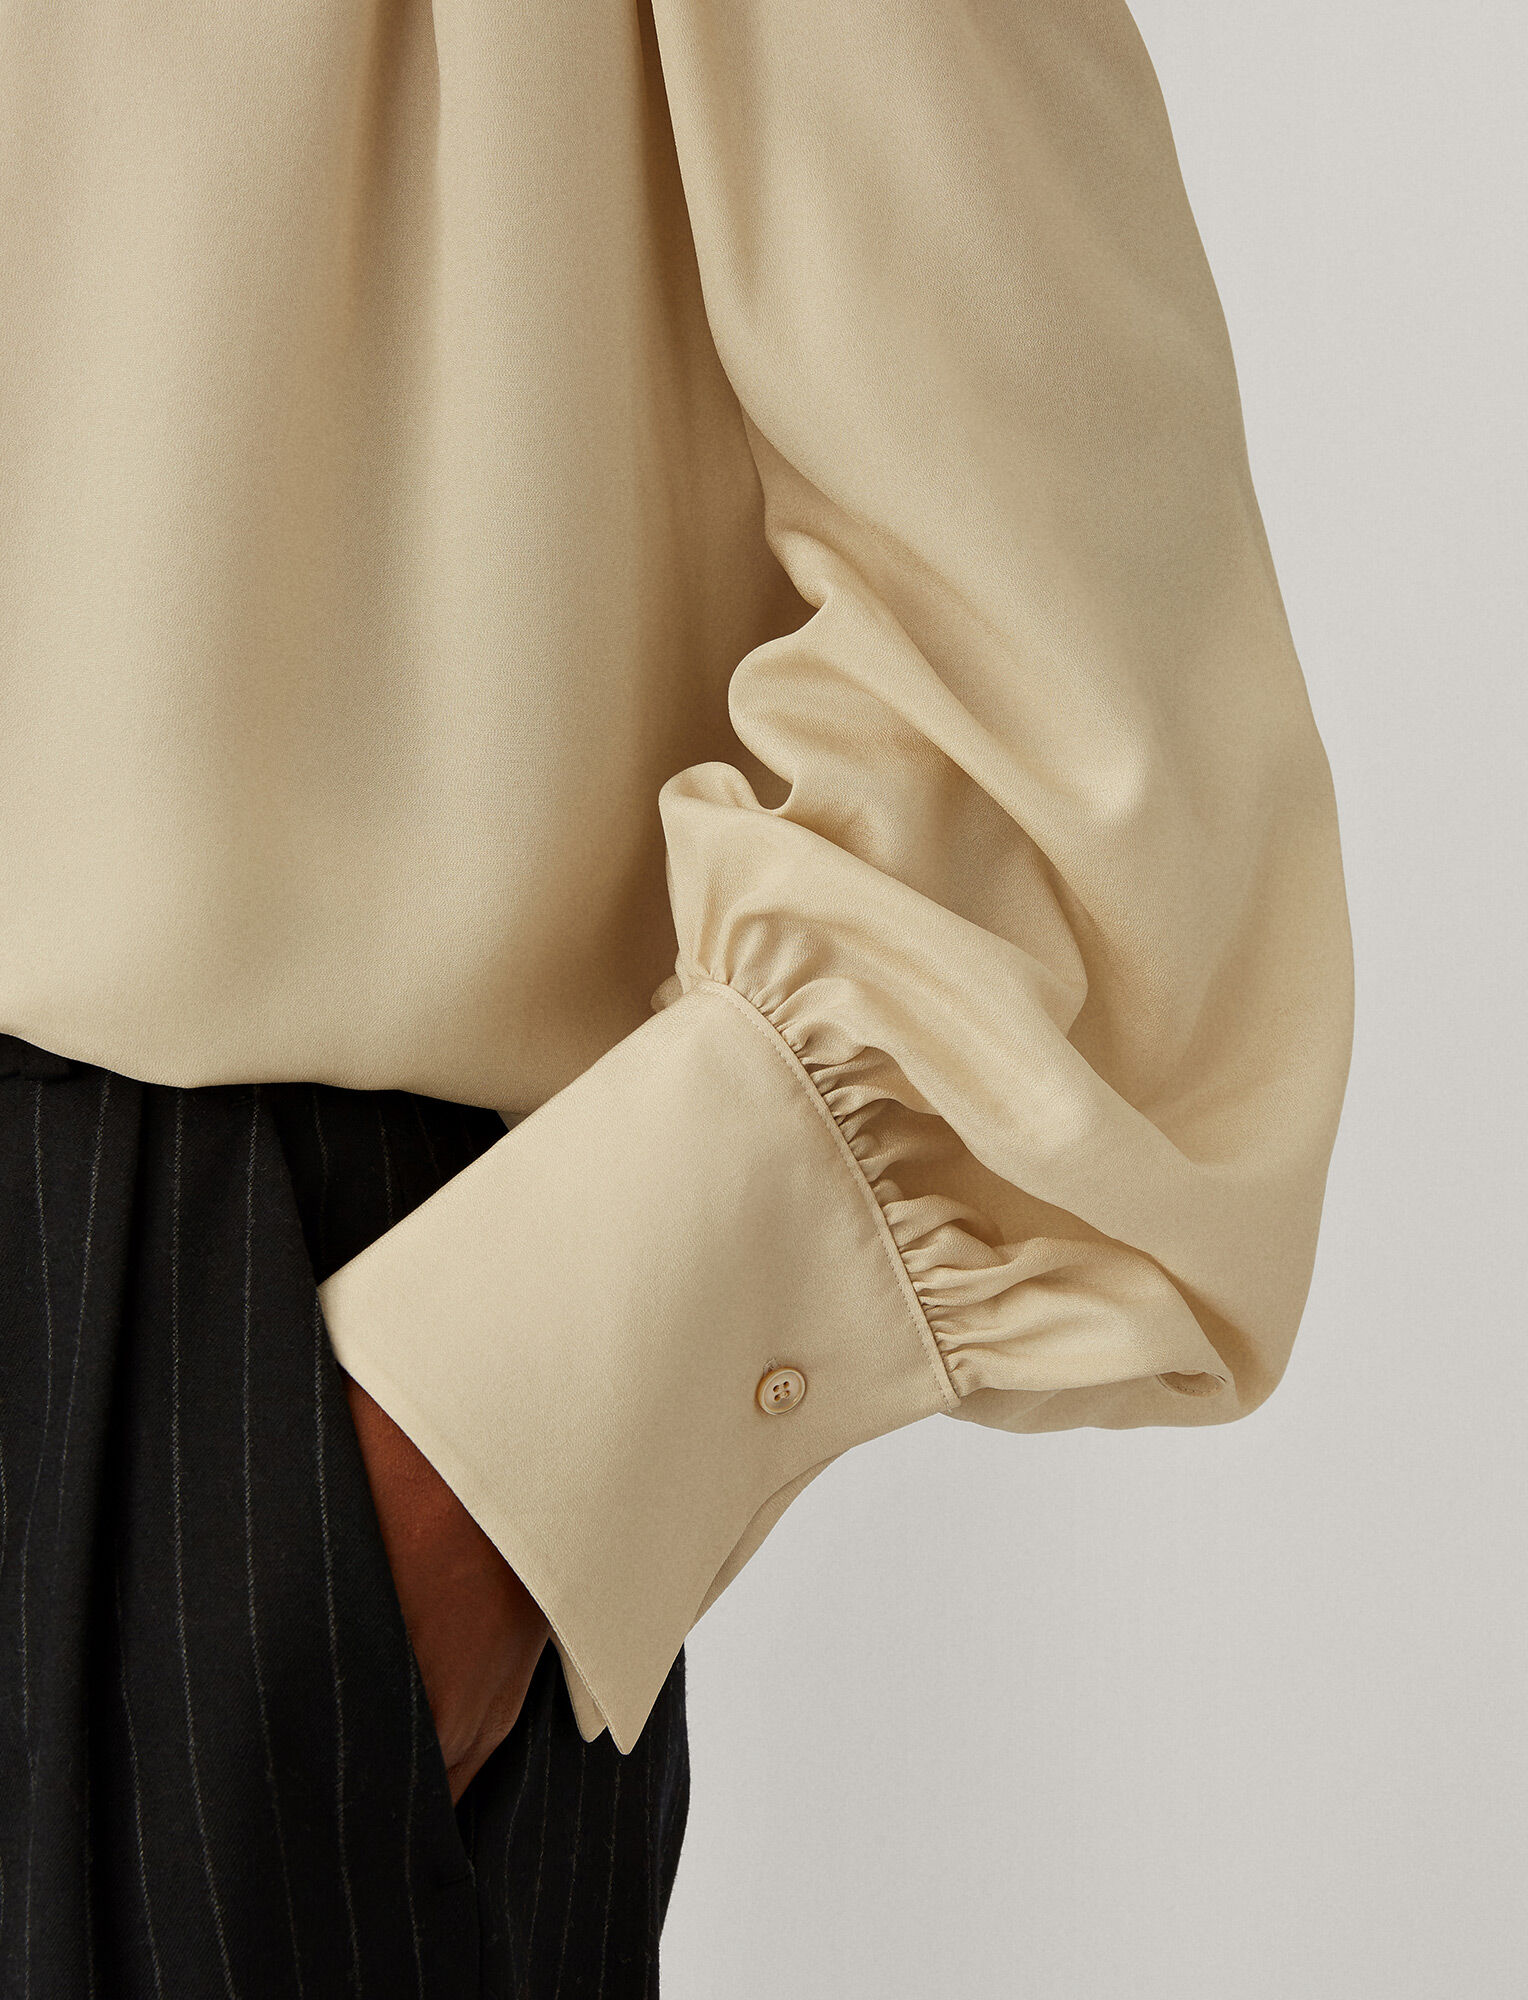 Joseph, Blanca Light Silk Blouse, in Marble